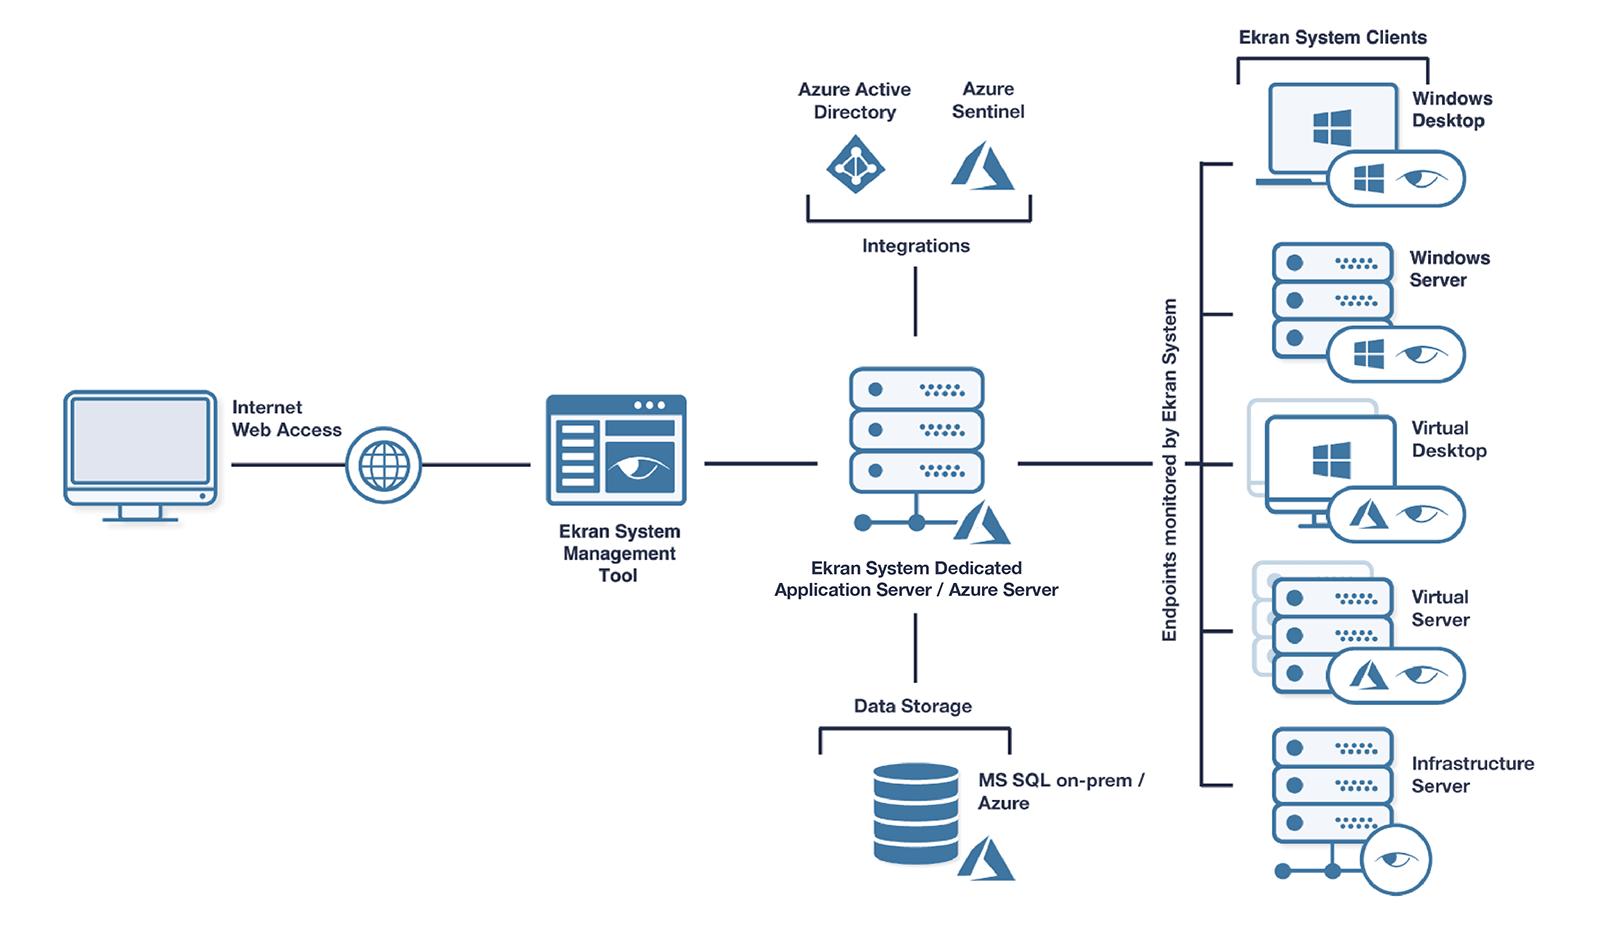 Full agent-based deployment scheme